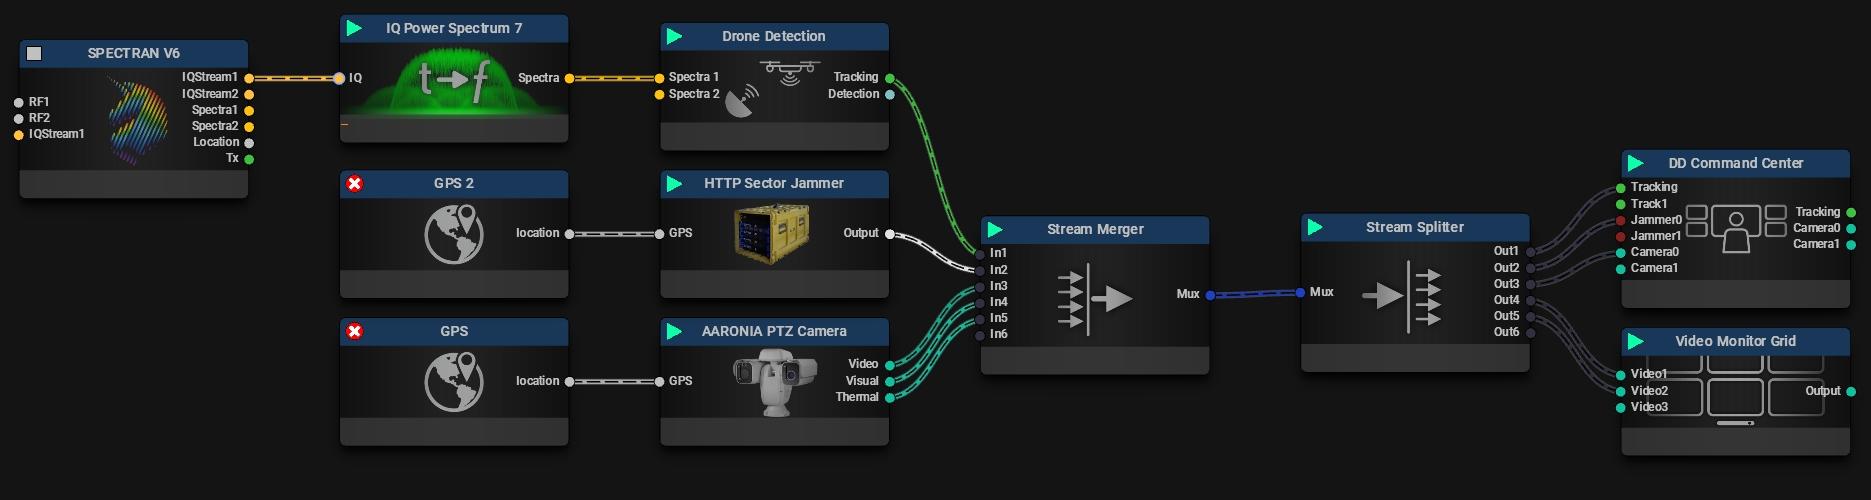 Drone Detection Software Mission Setup